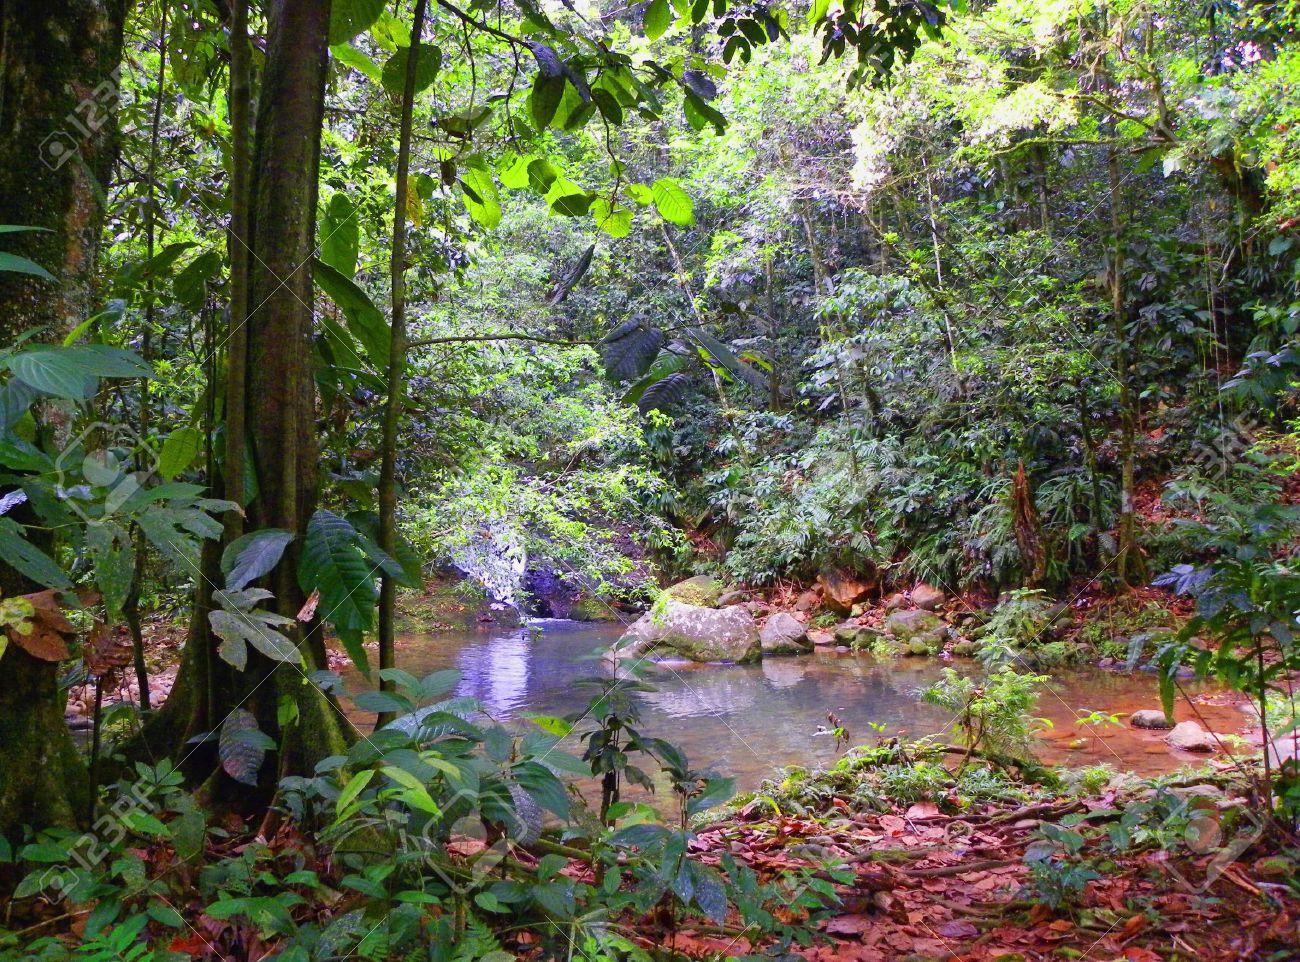 tropical rainforest vegetation Stock Photo - 16940535